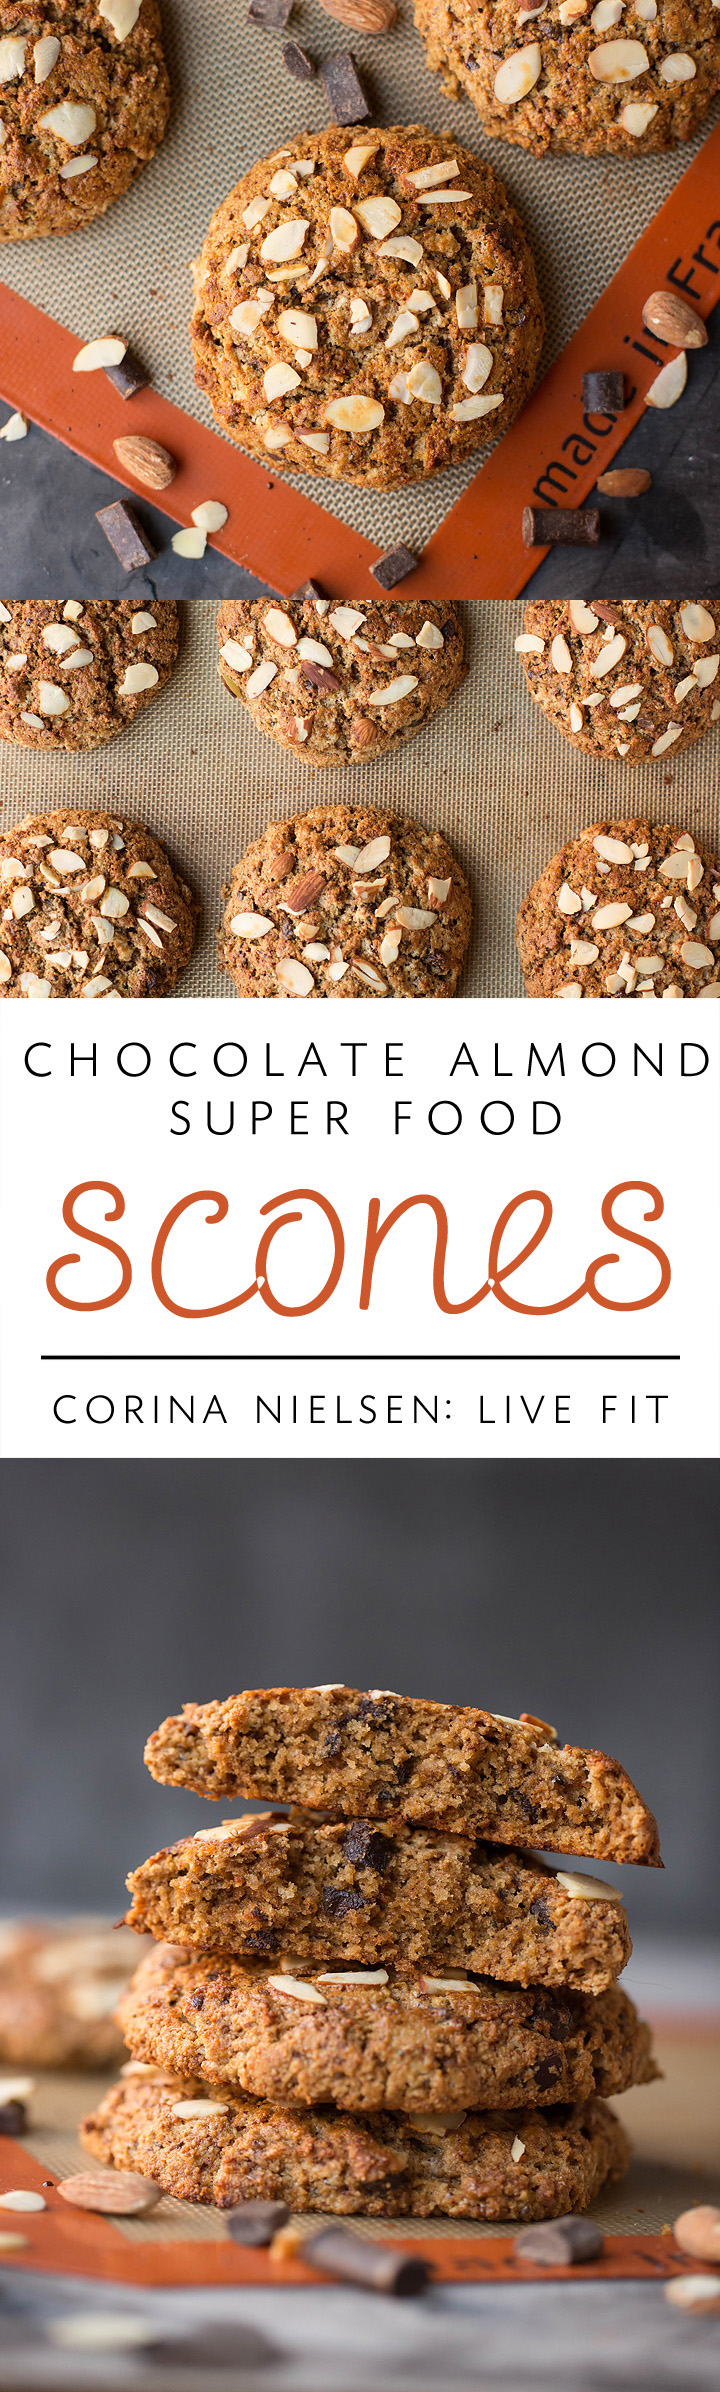 chocolate almond super food scones